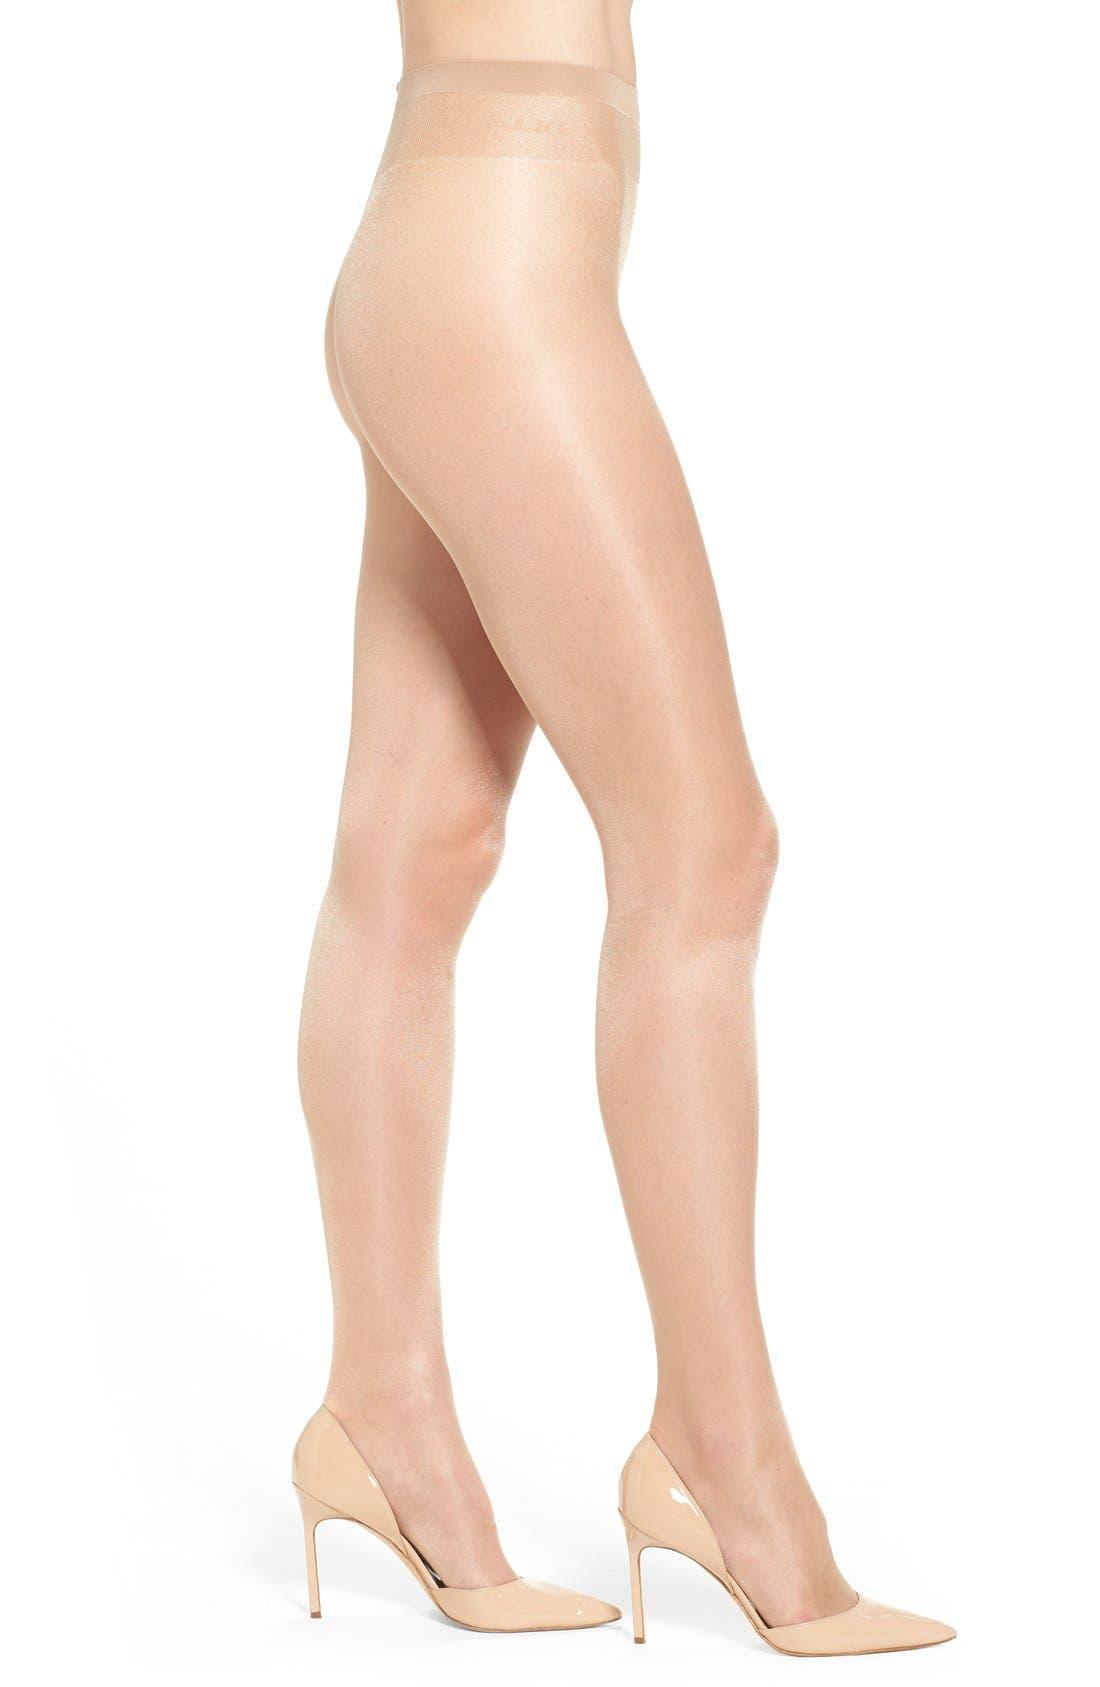 Falke 'Pure Shine 15 Denier' Stockings